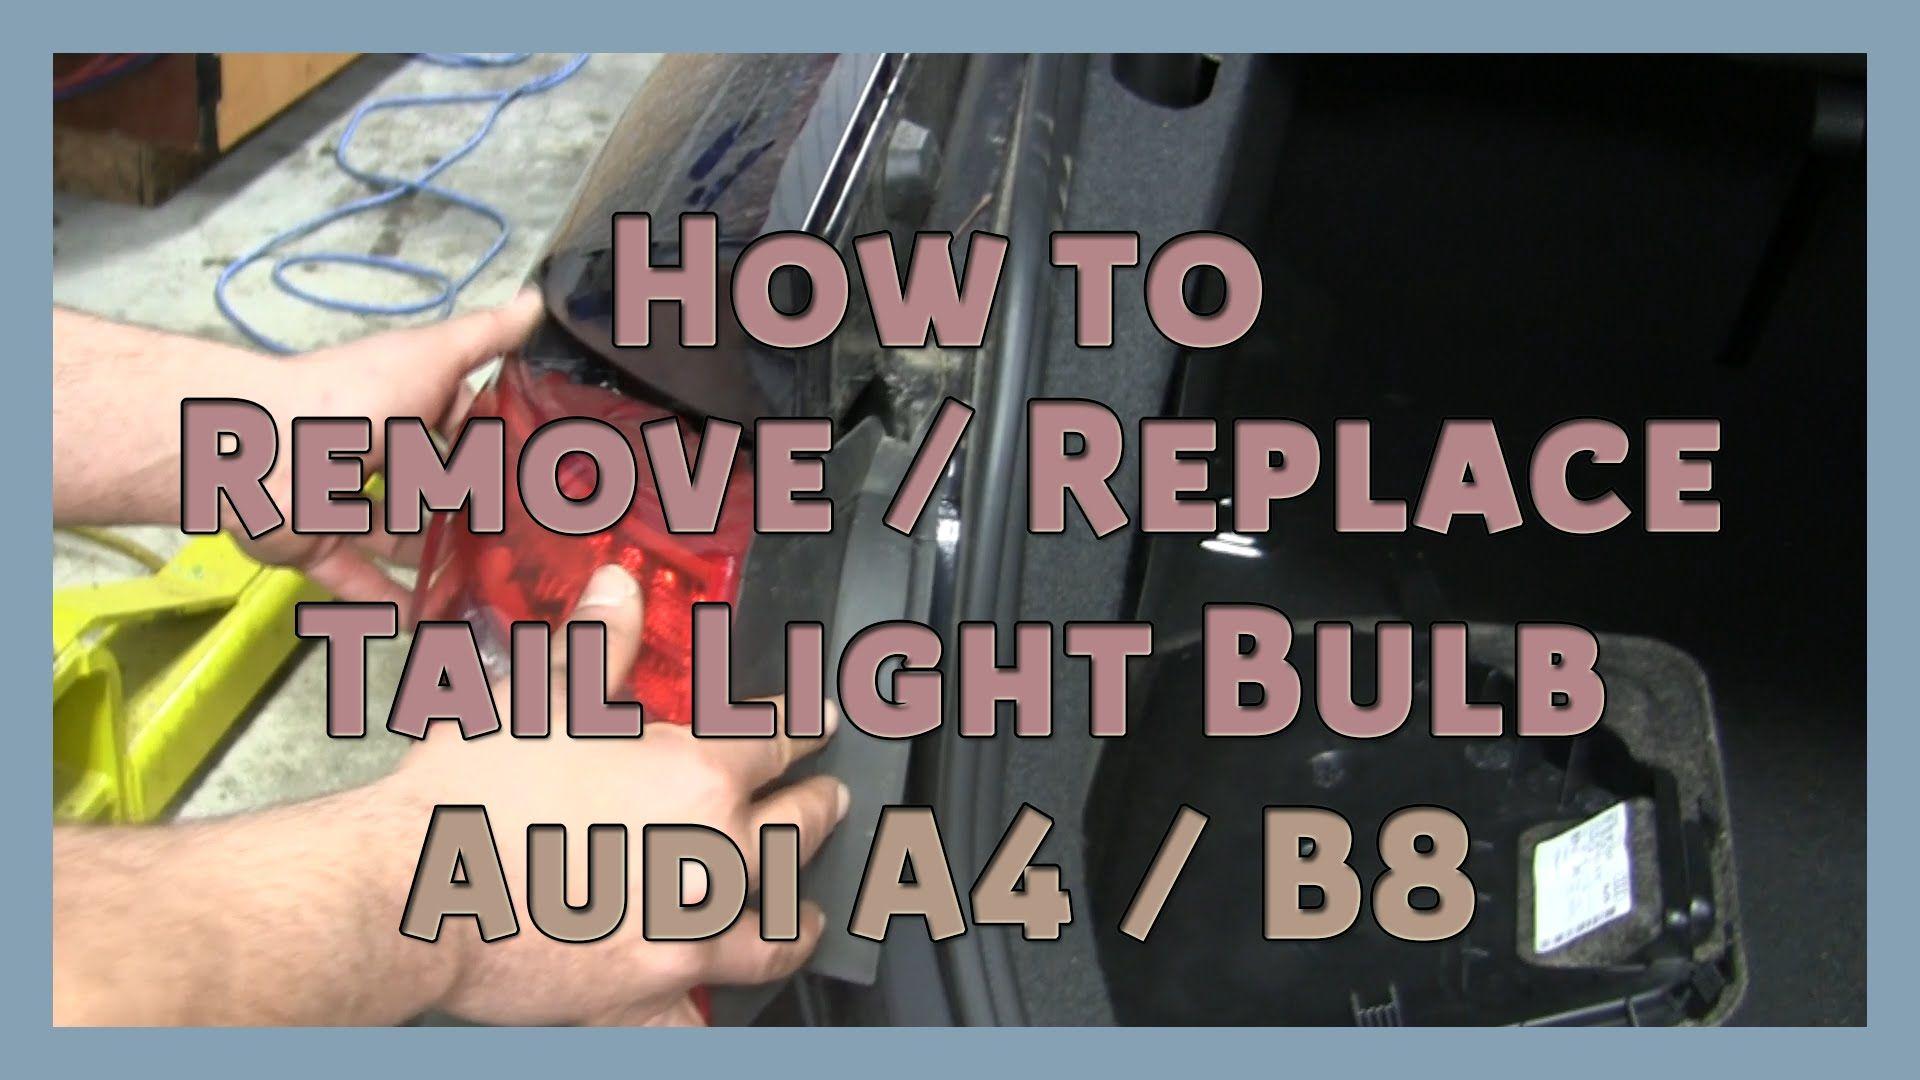 How To Remove Replace Tail Light Bulb 2008 2014 Audi A4 B8 B8 5 Audi A4 Audi Tail Light